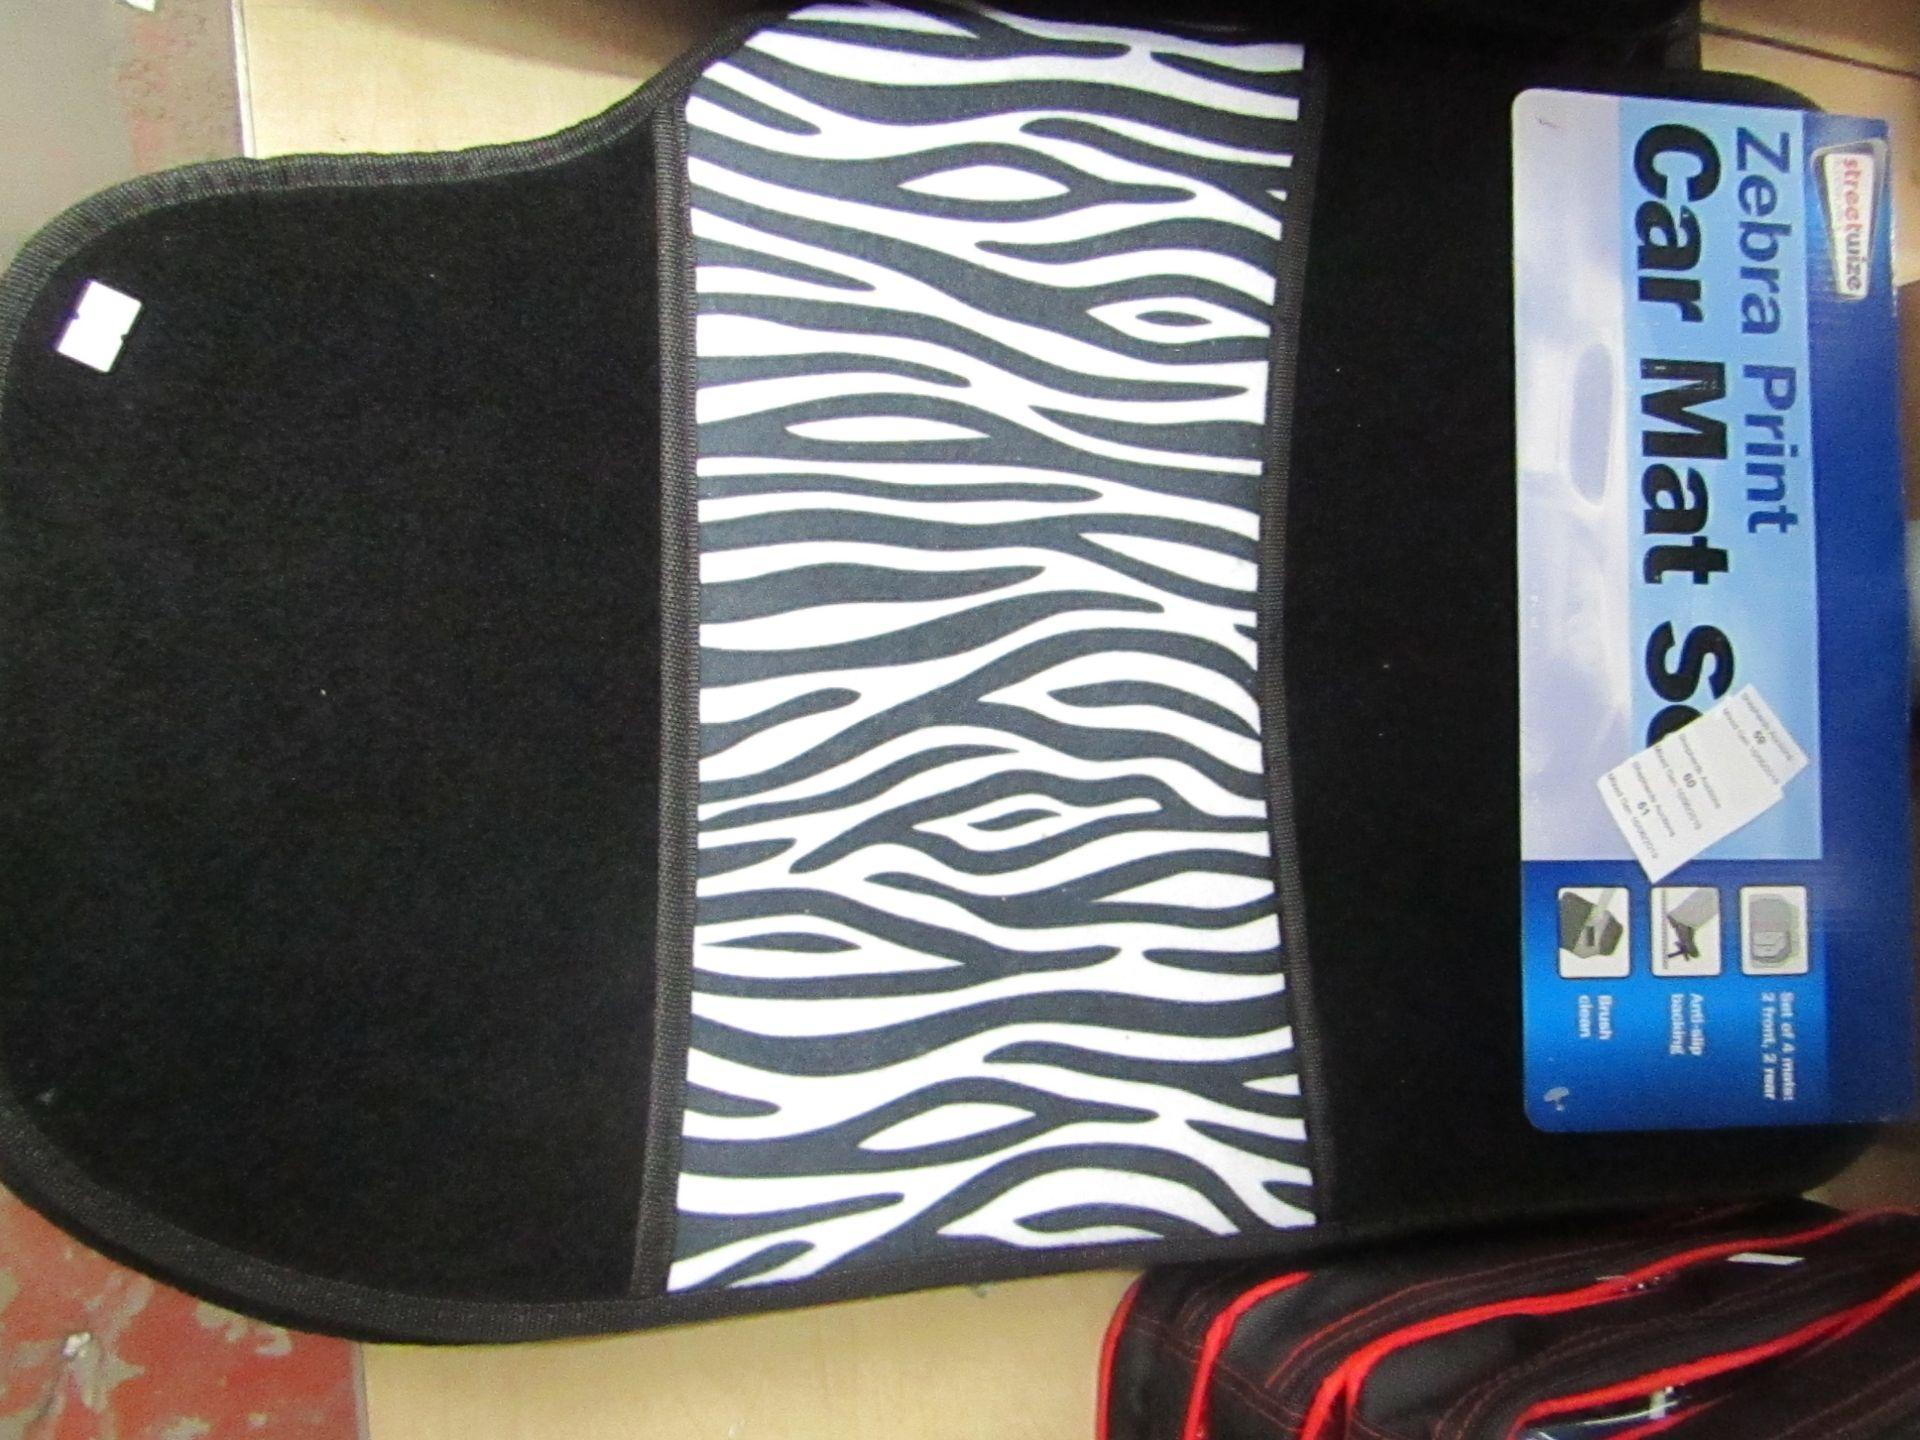 Lot 60 - Streetwise Zebra Print 4 piece car mat set, new with POS still attached